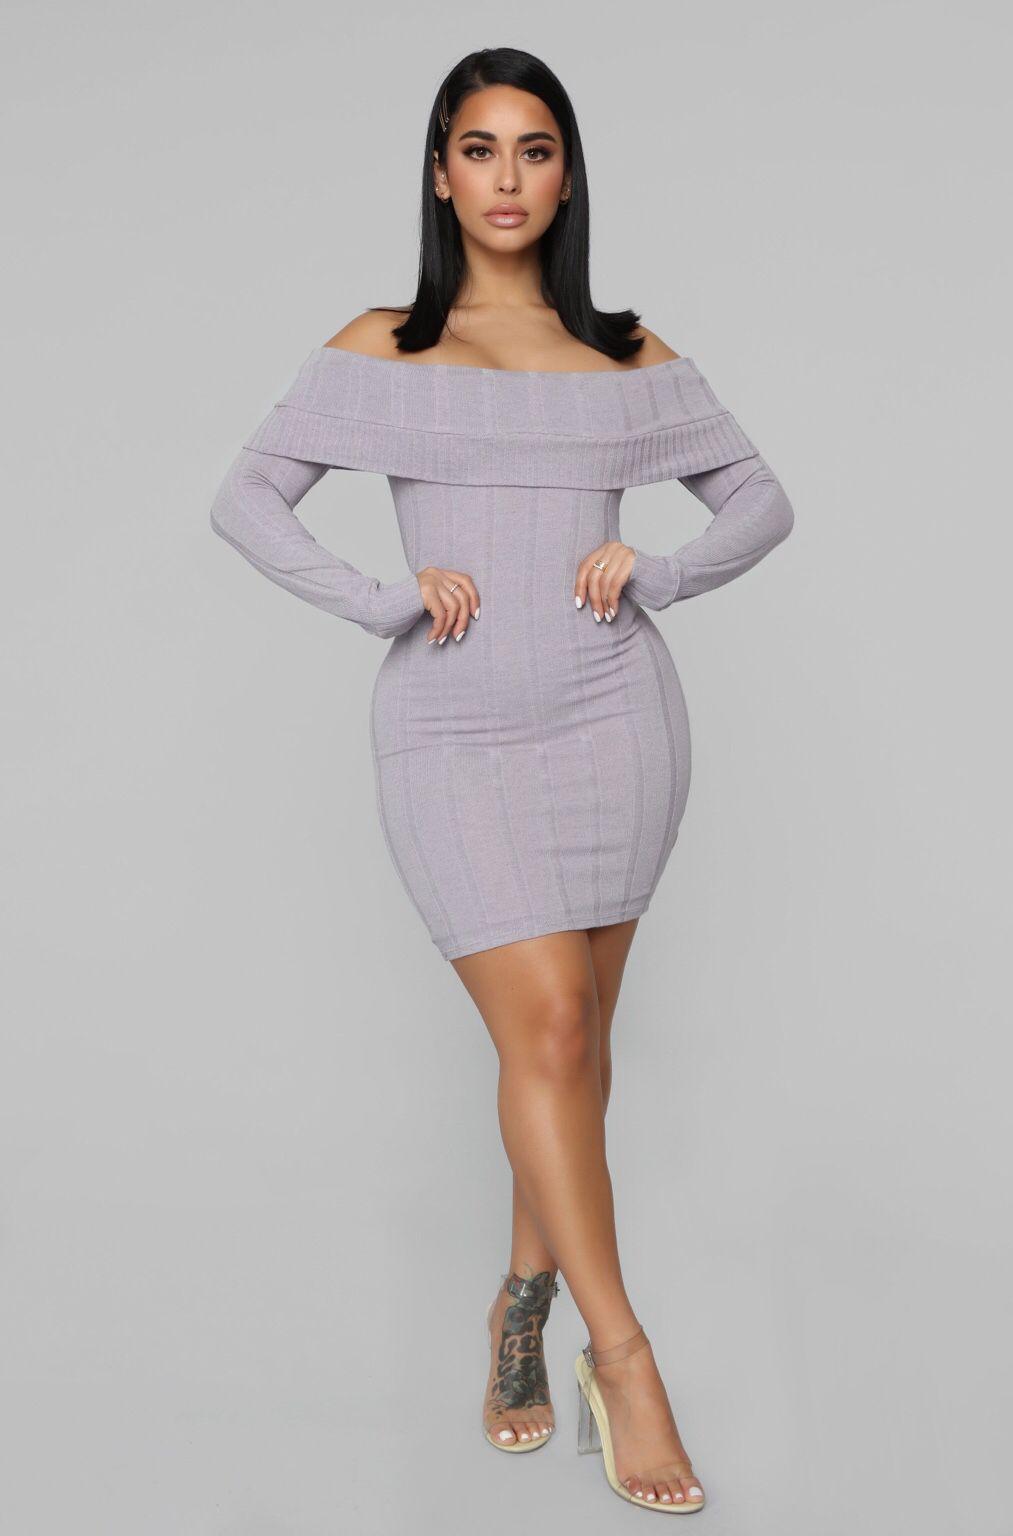 cc23ef92919 Exposing My Soft Side Sweater Dress - Lavender Cheap Streetwear